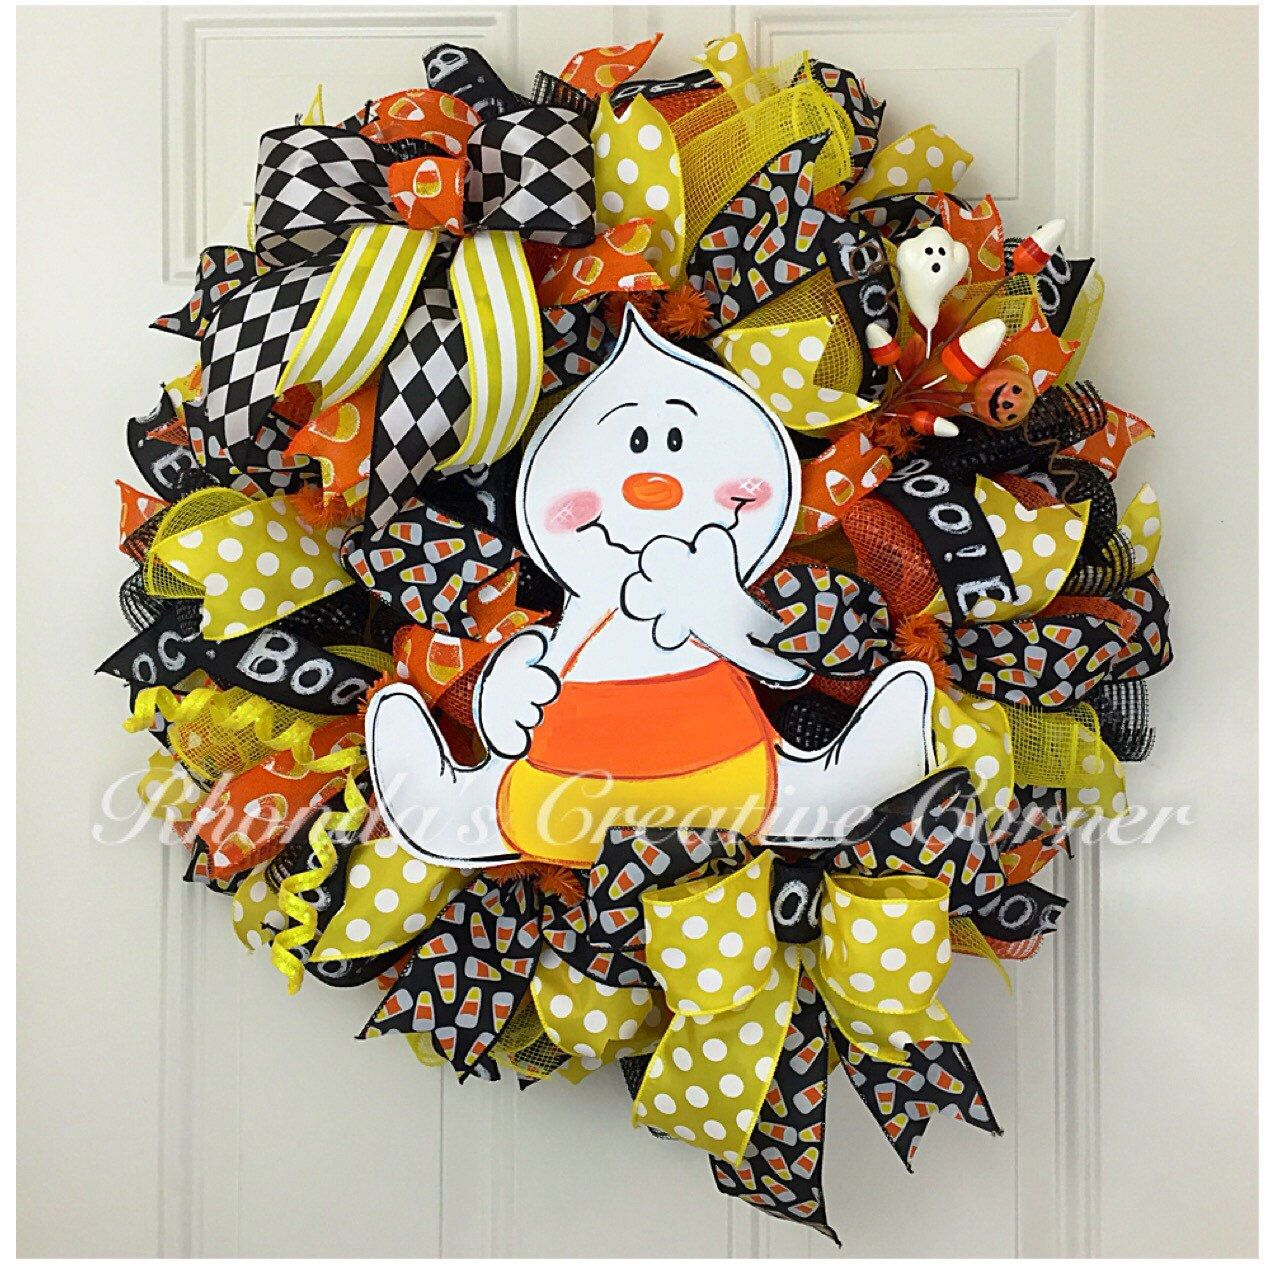 Ghost Halloween Deco Mesh Wreath, Adorable Ghost Wreath, Deco Mesh Ghost Wreath…